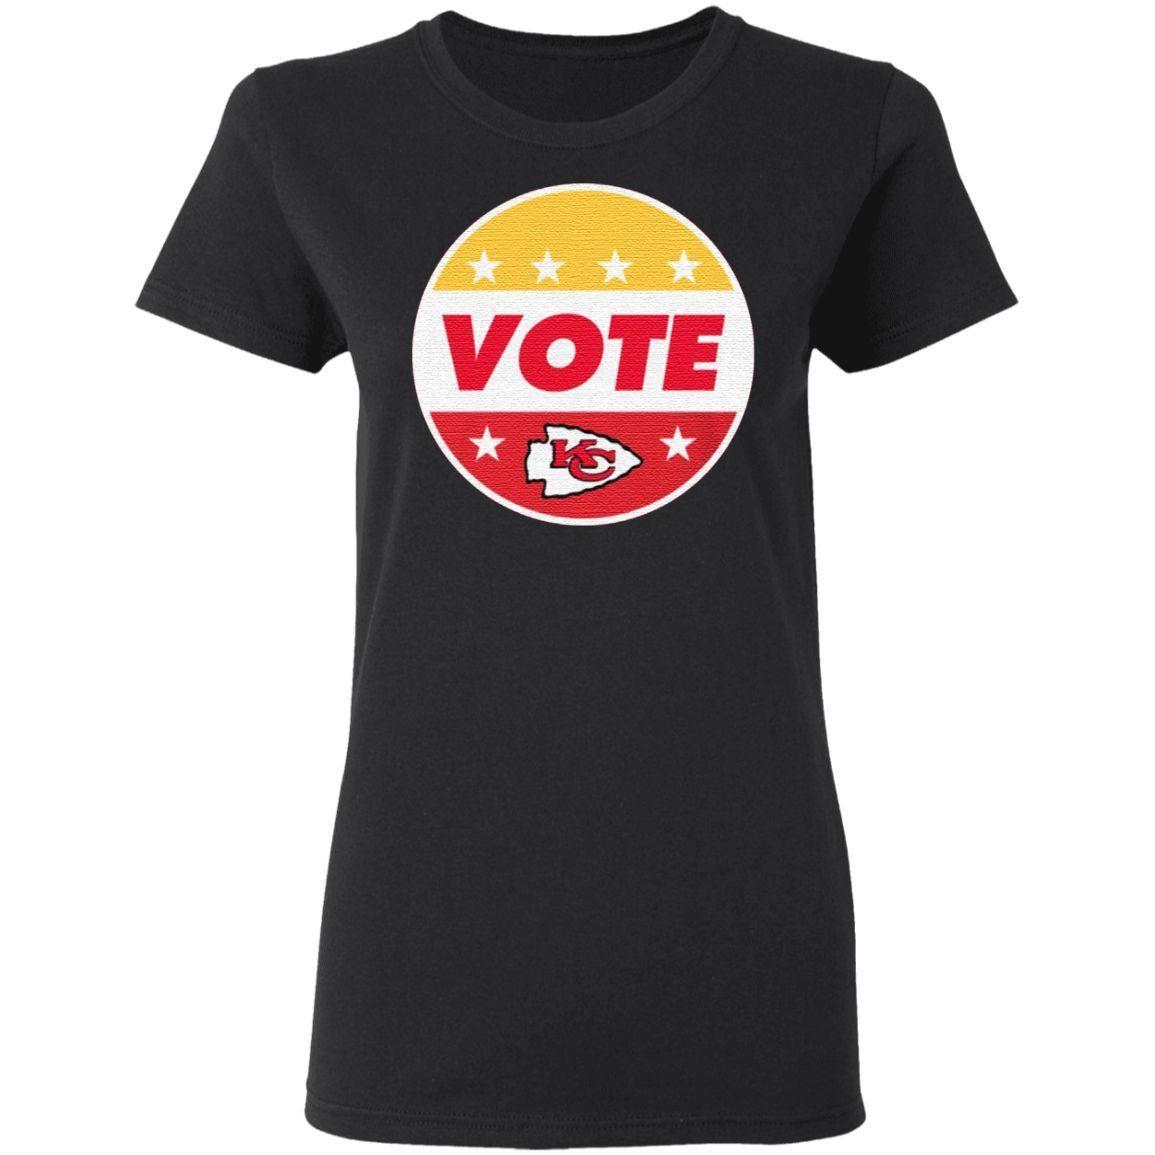 Patrick Mahomes Kansas City Chiefs Vote T Shirt